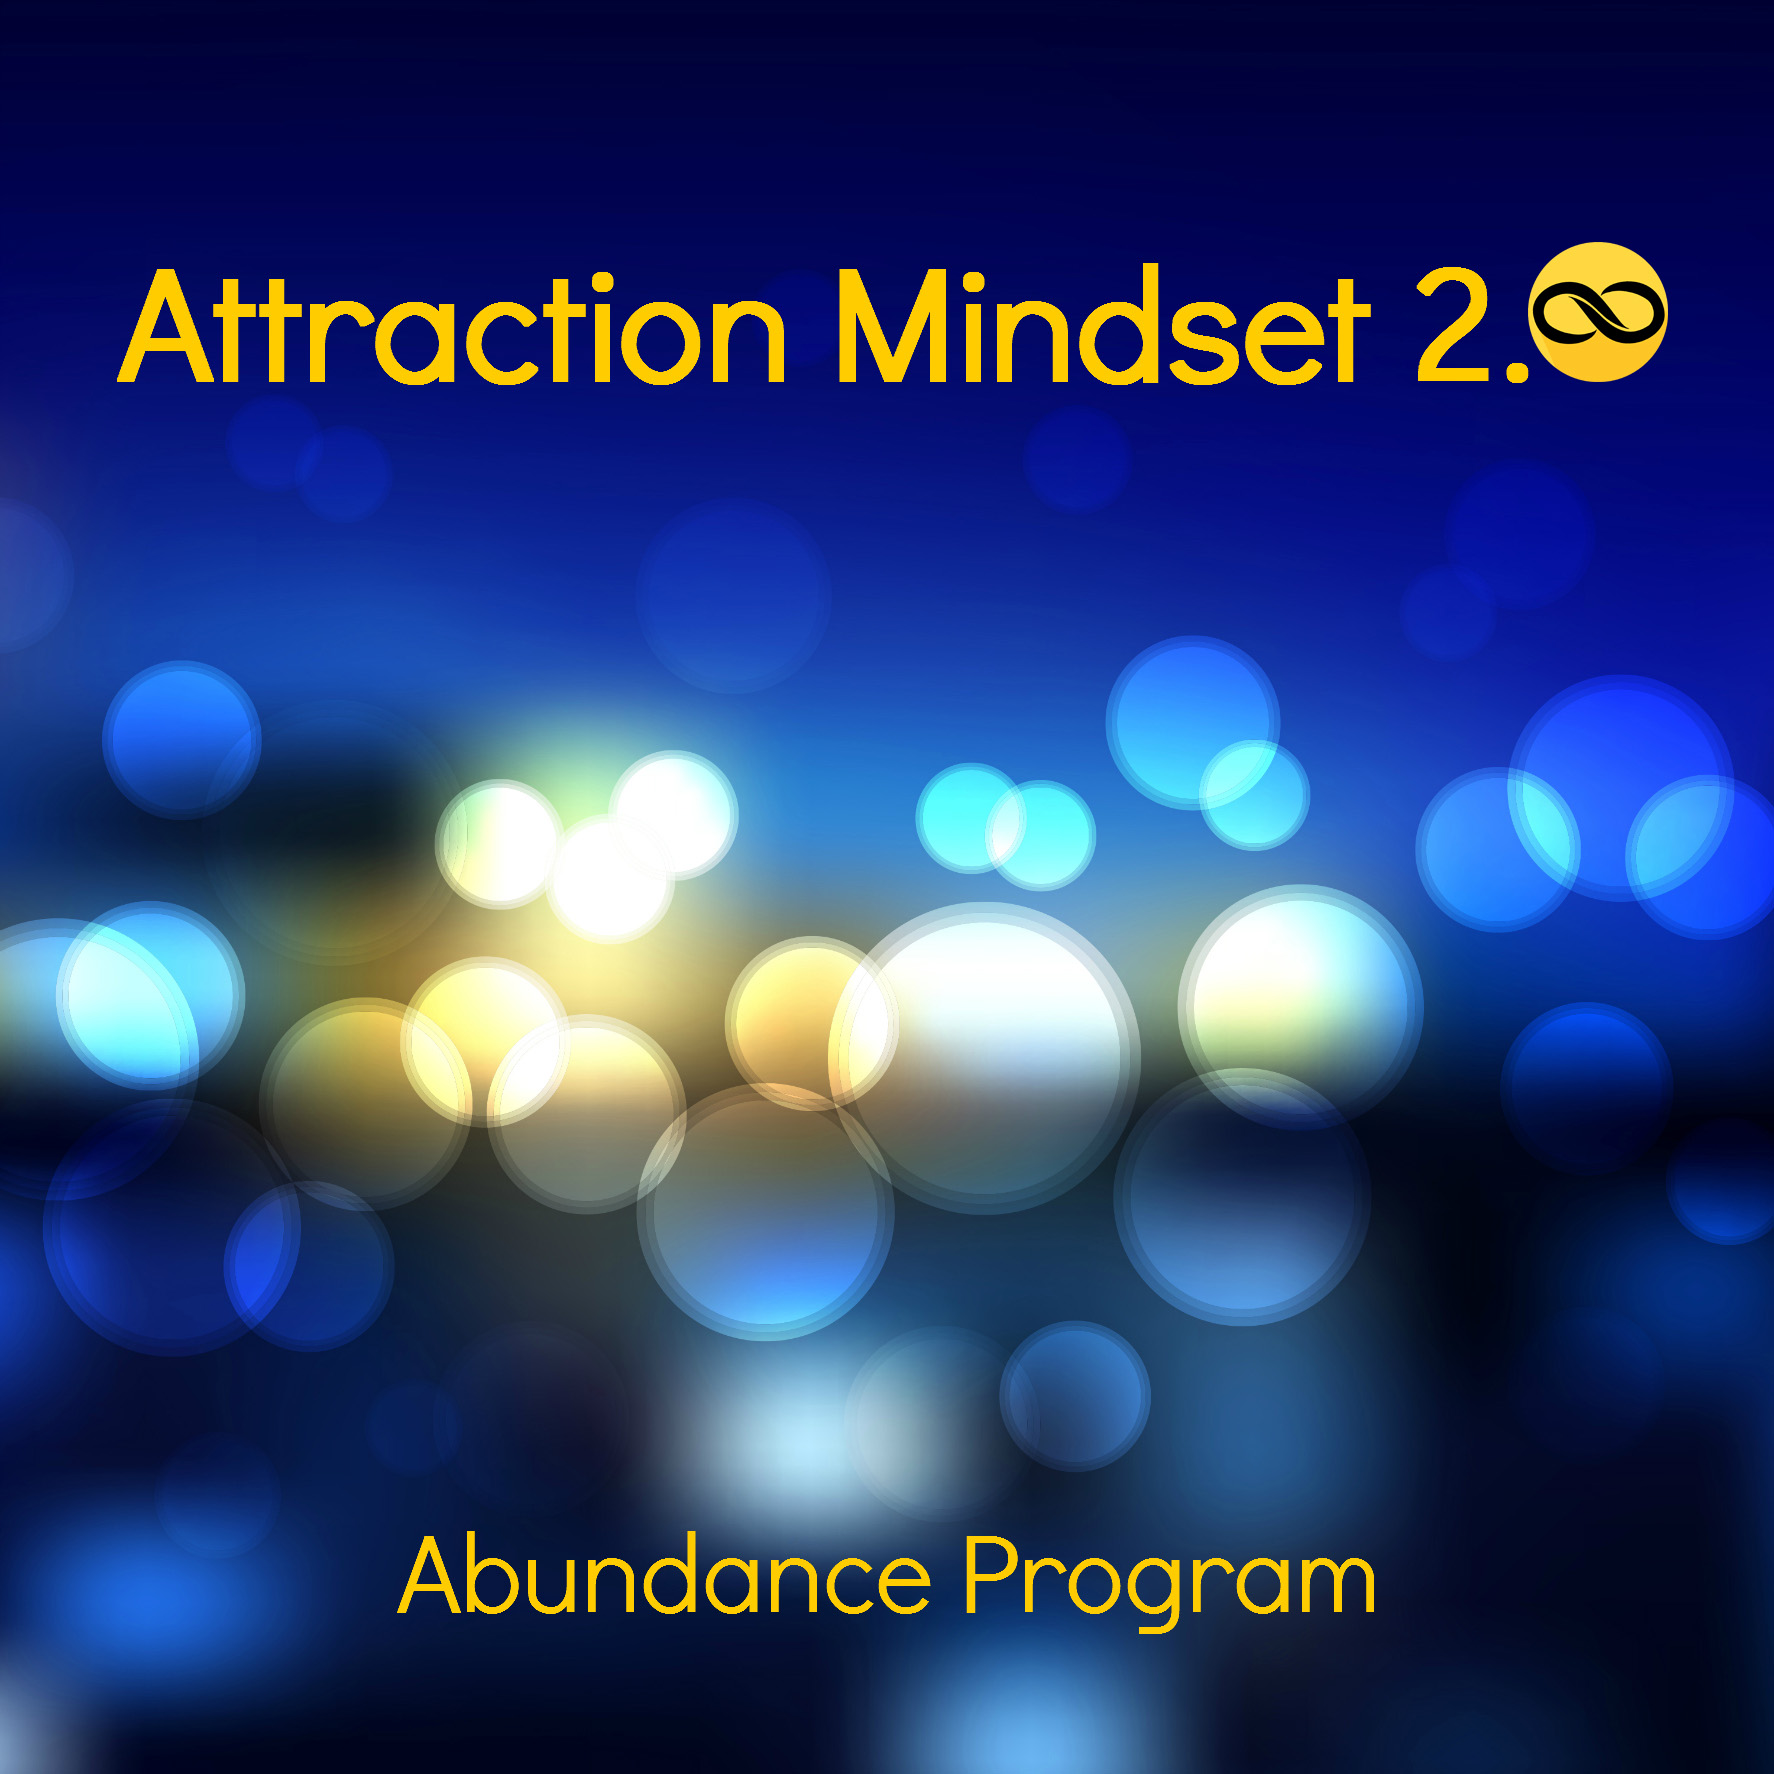 math worksheet : attraction mindset abundance program  the law of attraction center : Fraction Attraction Worksheet